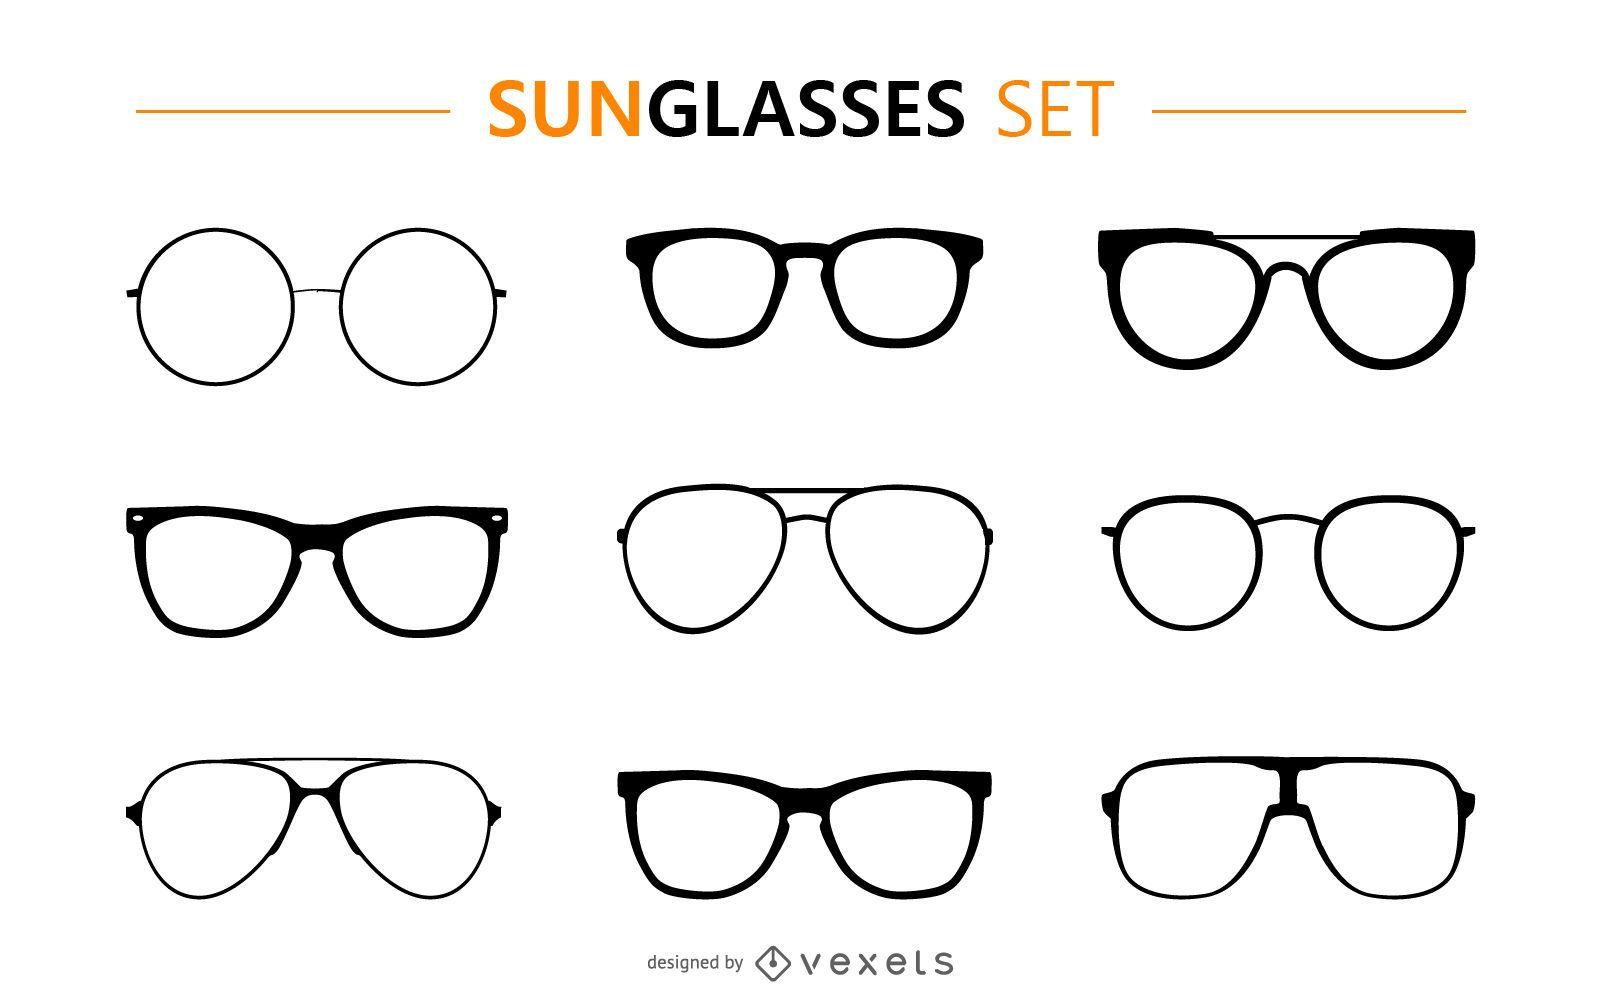 Sunglasses silhouette set